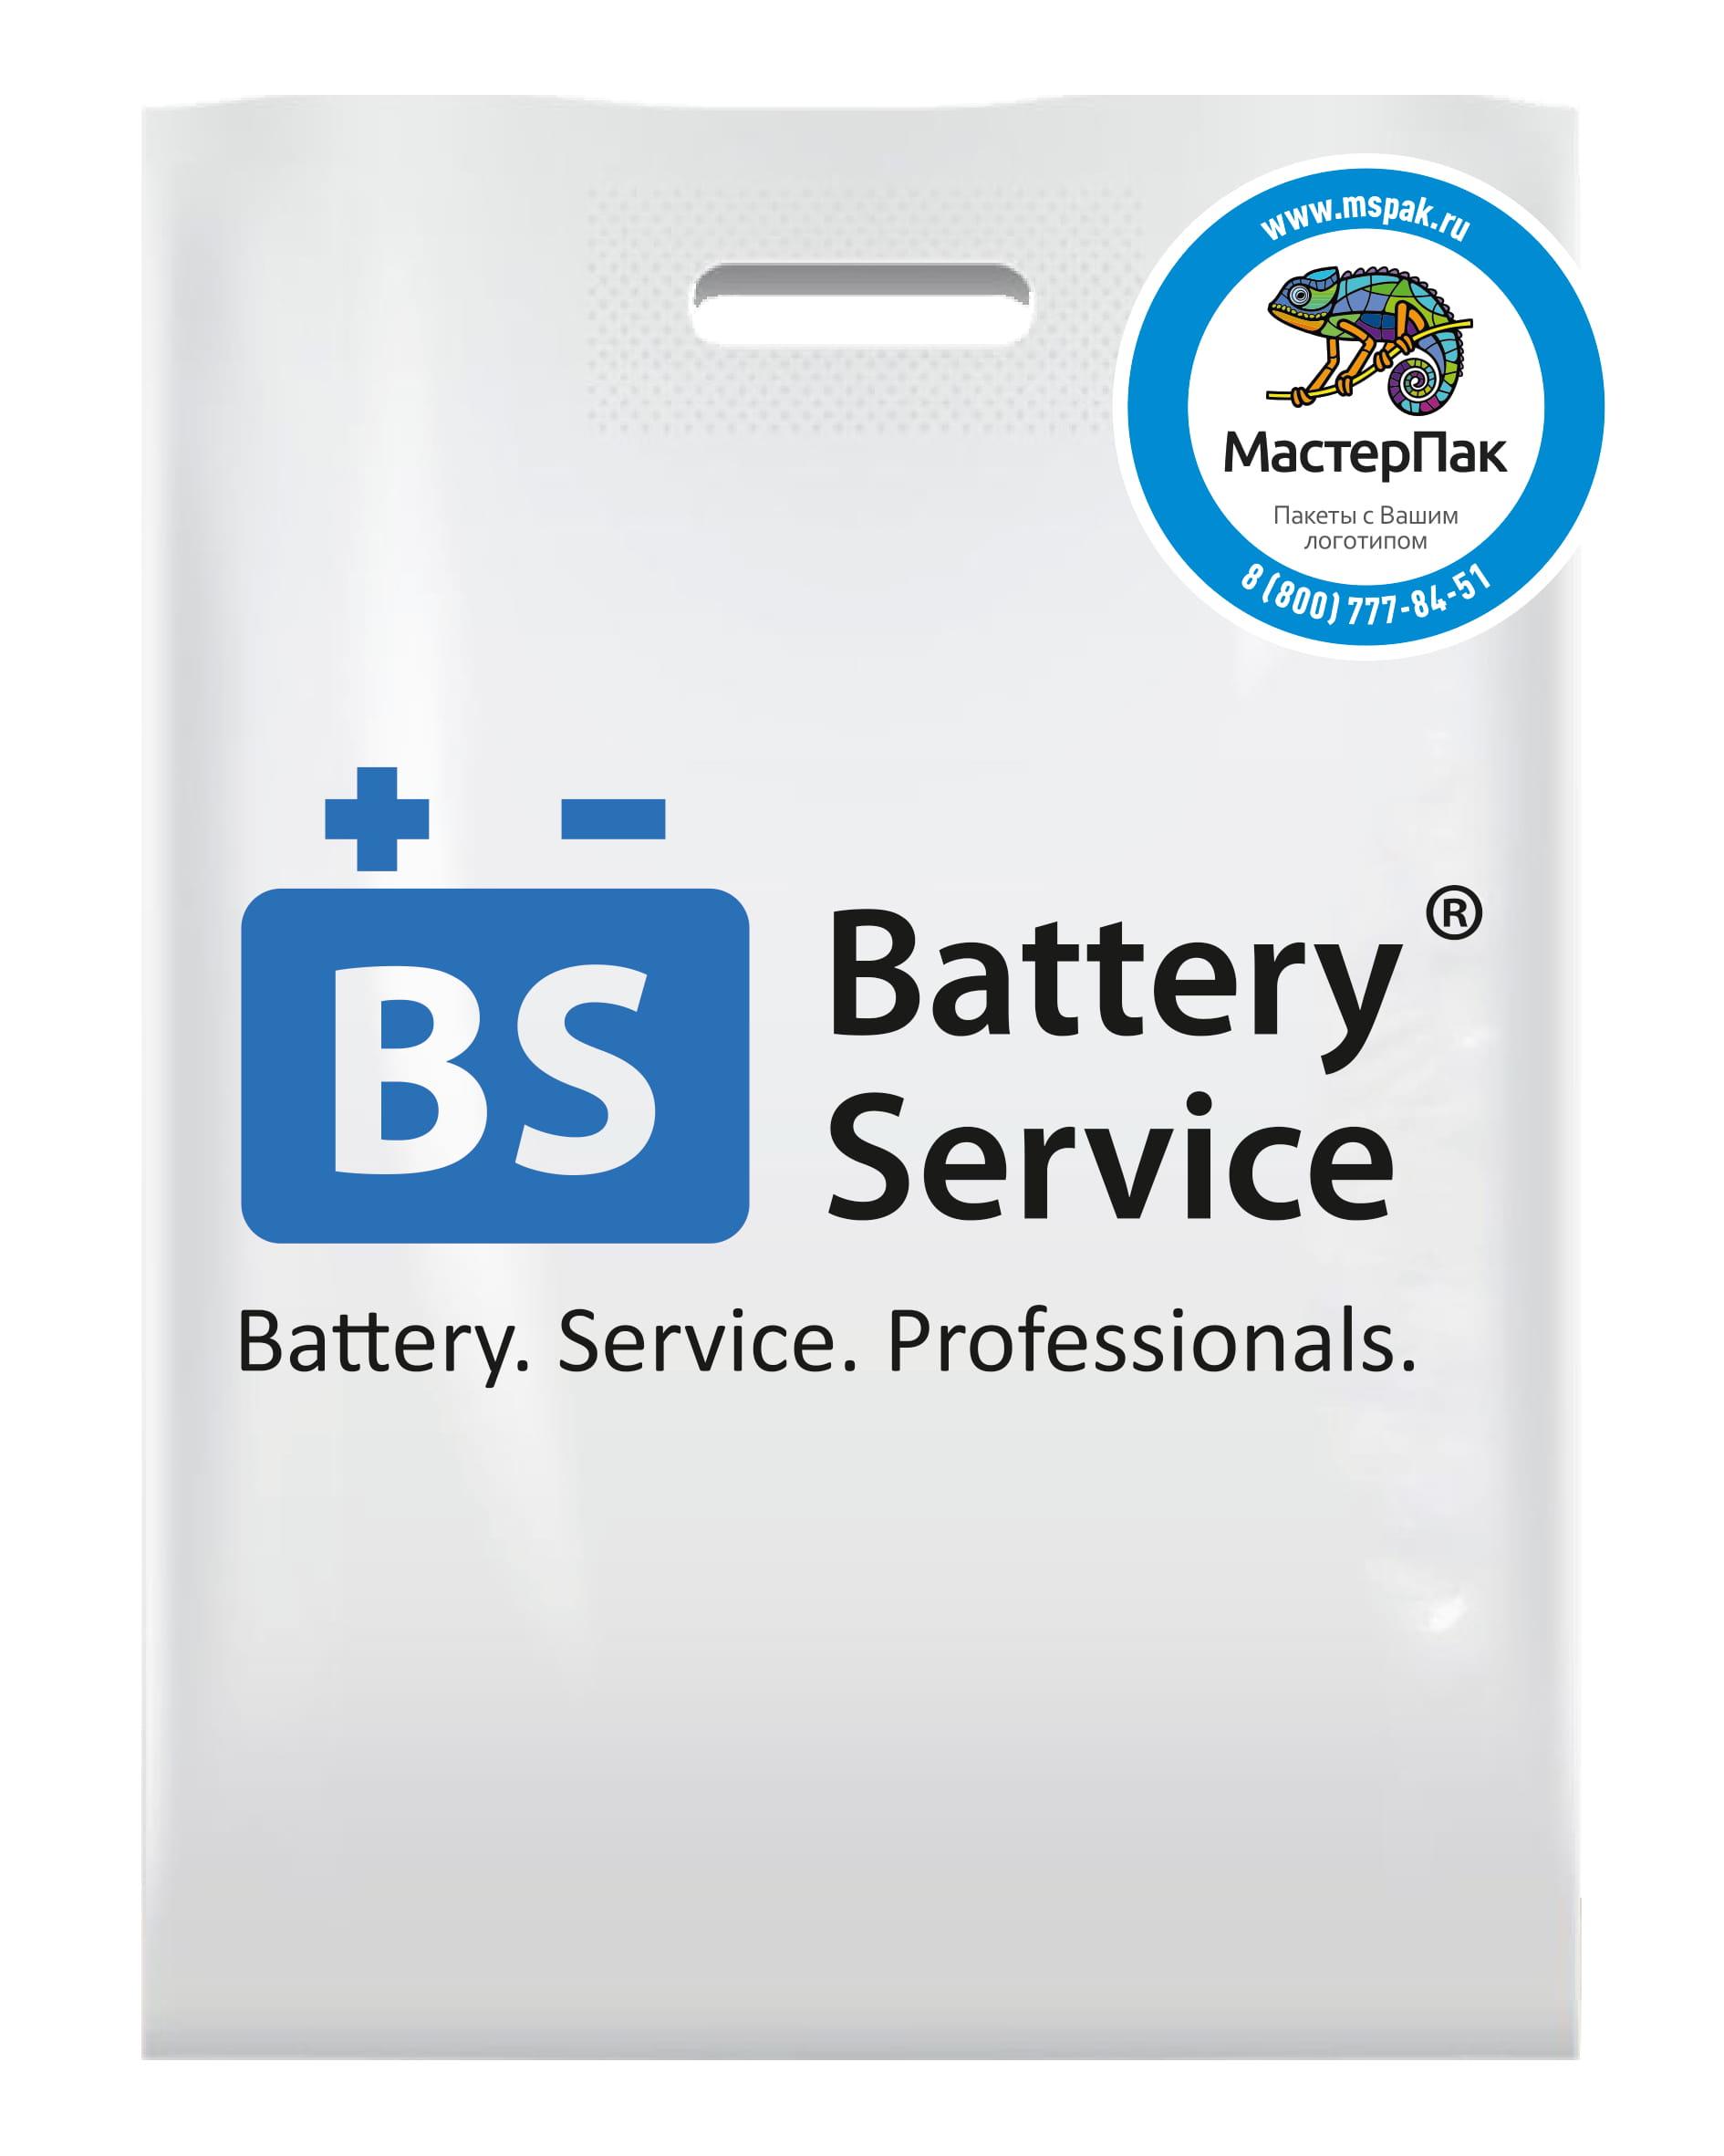 Пакет ПВД с логотипом Battery Service, Москва, 70 мкм, 36*45, белый